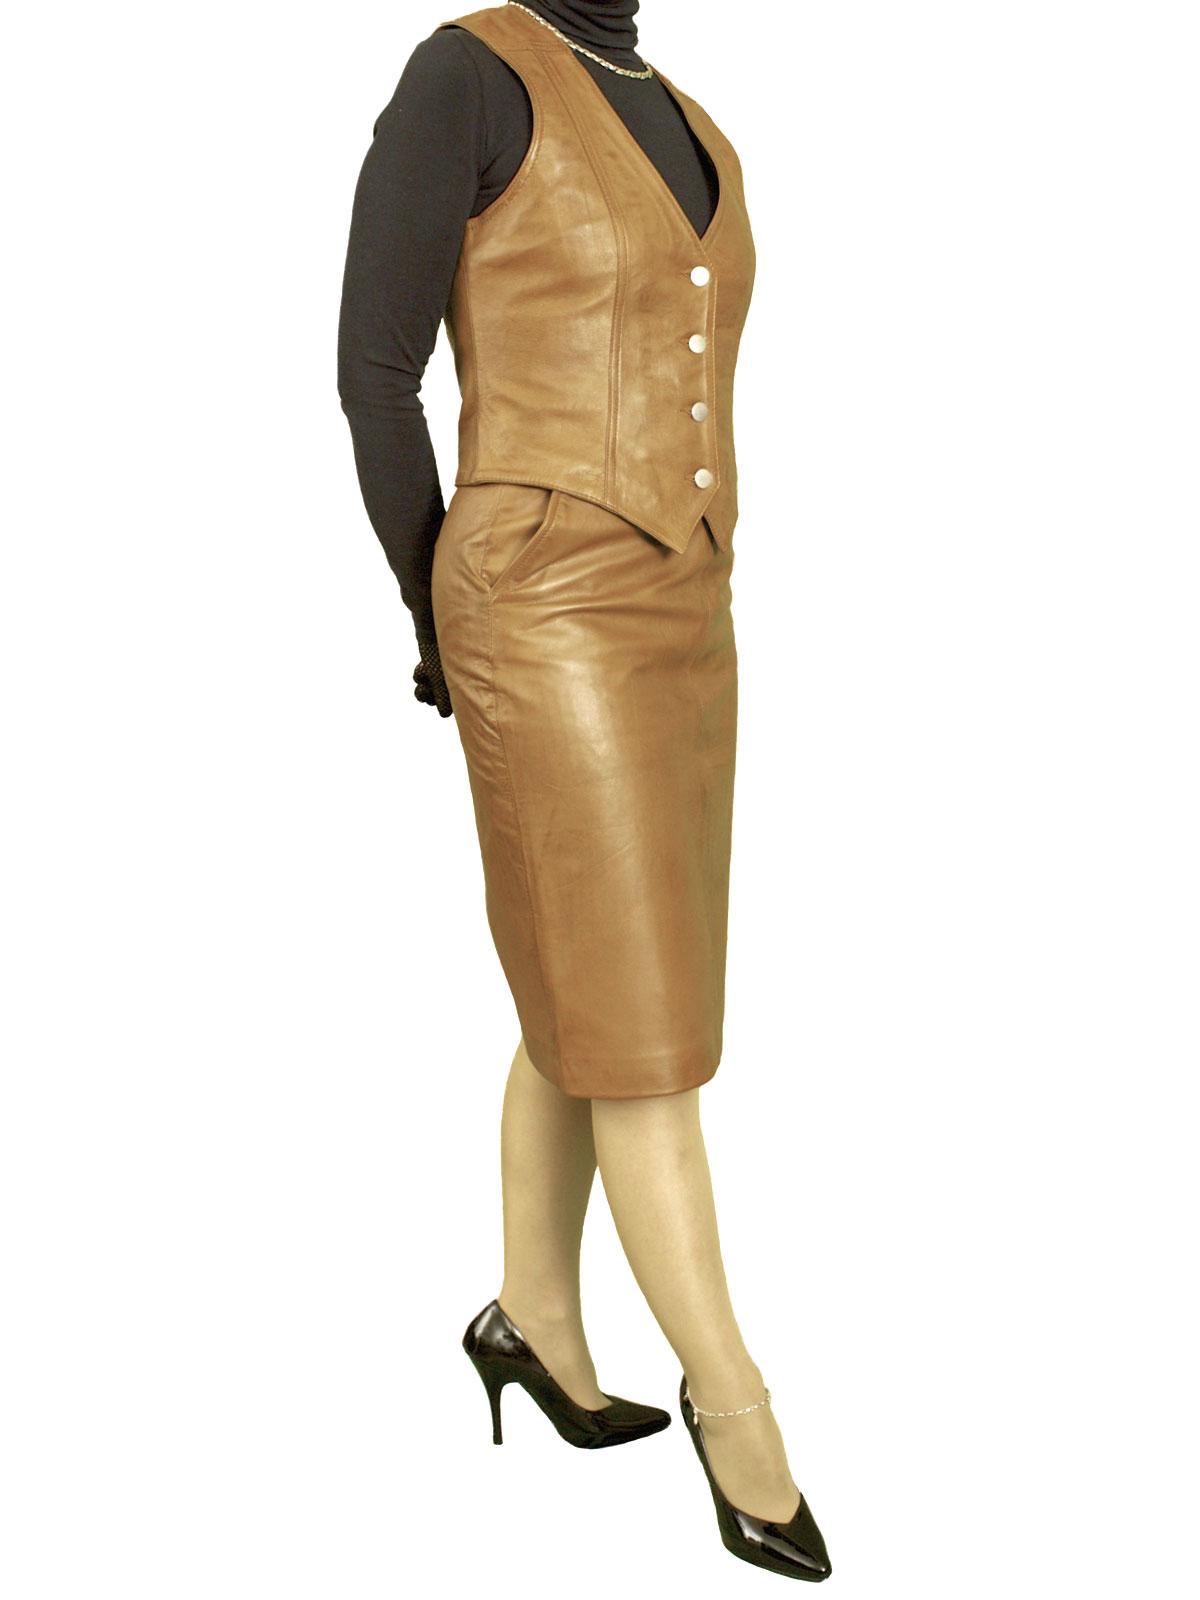 Leather Pencil Skirt, luxury soft, knee length